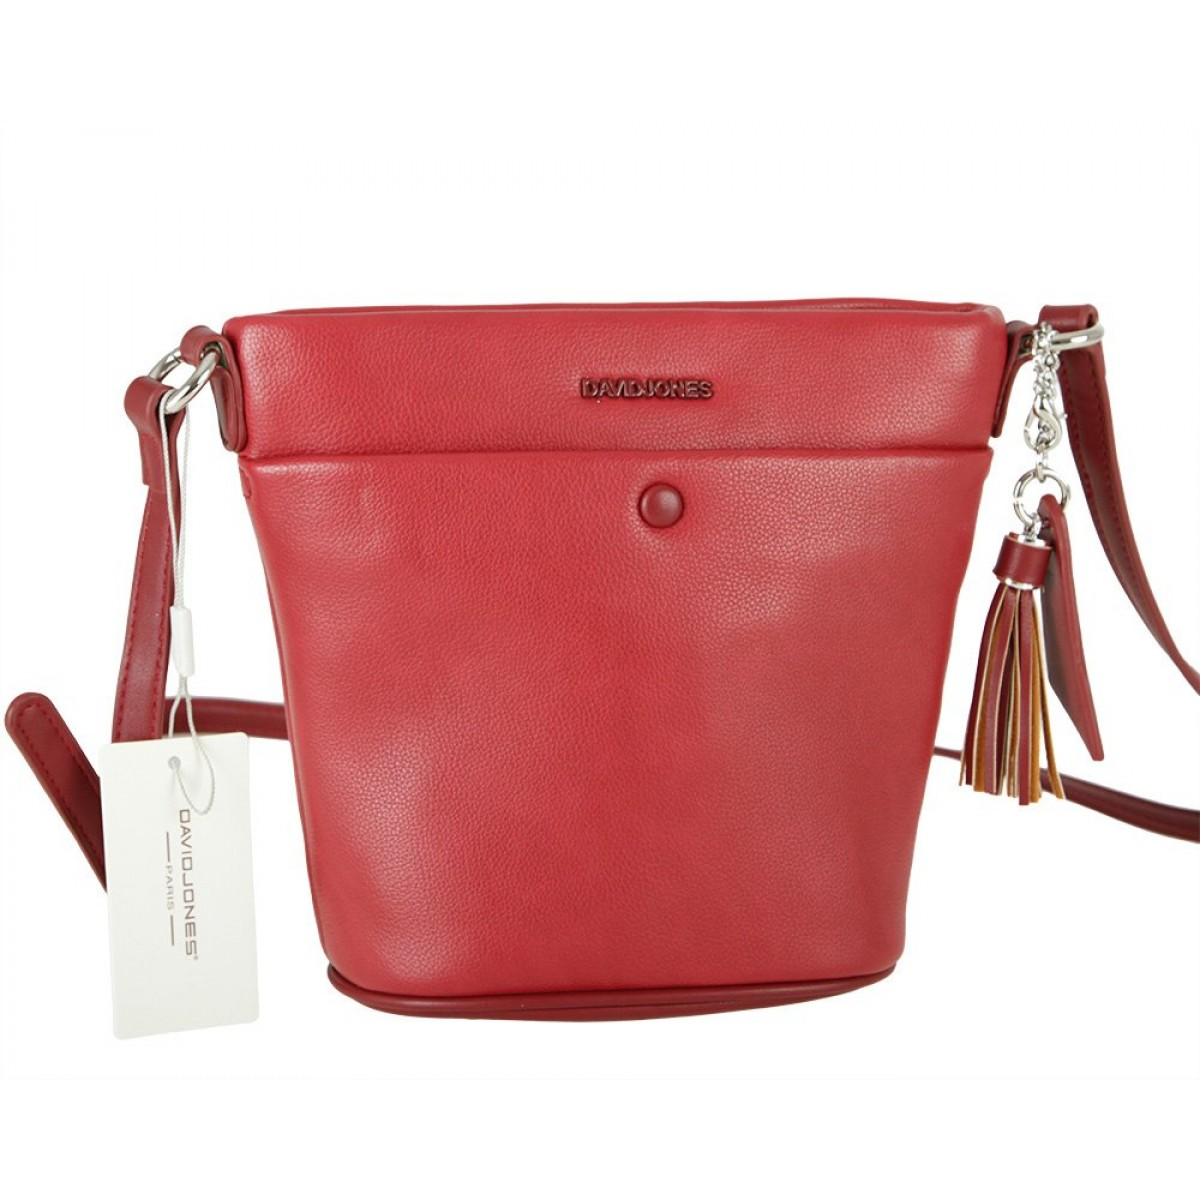 Жіноча сумка David Jones CM5851 RED